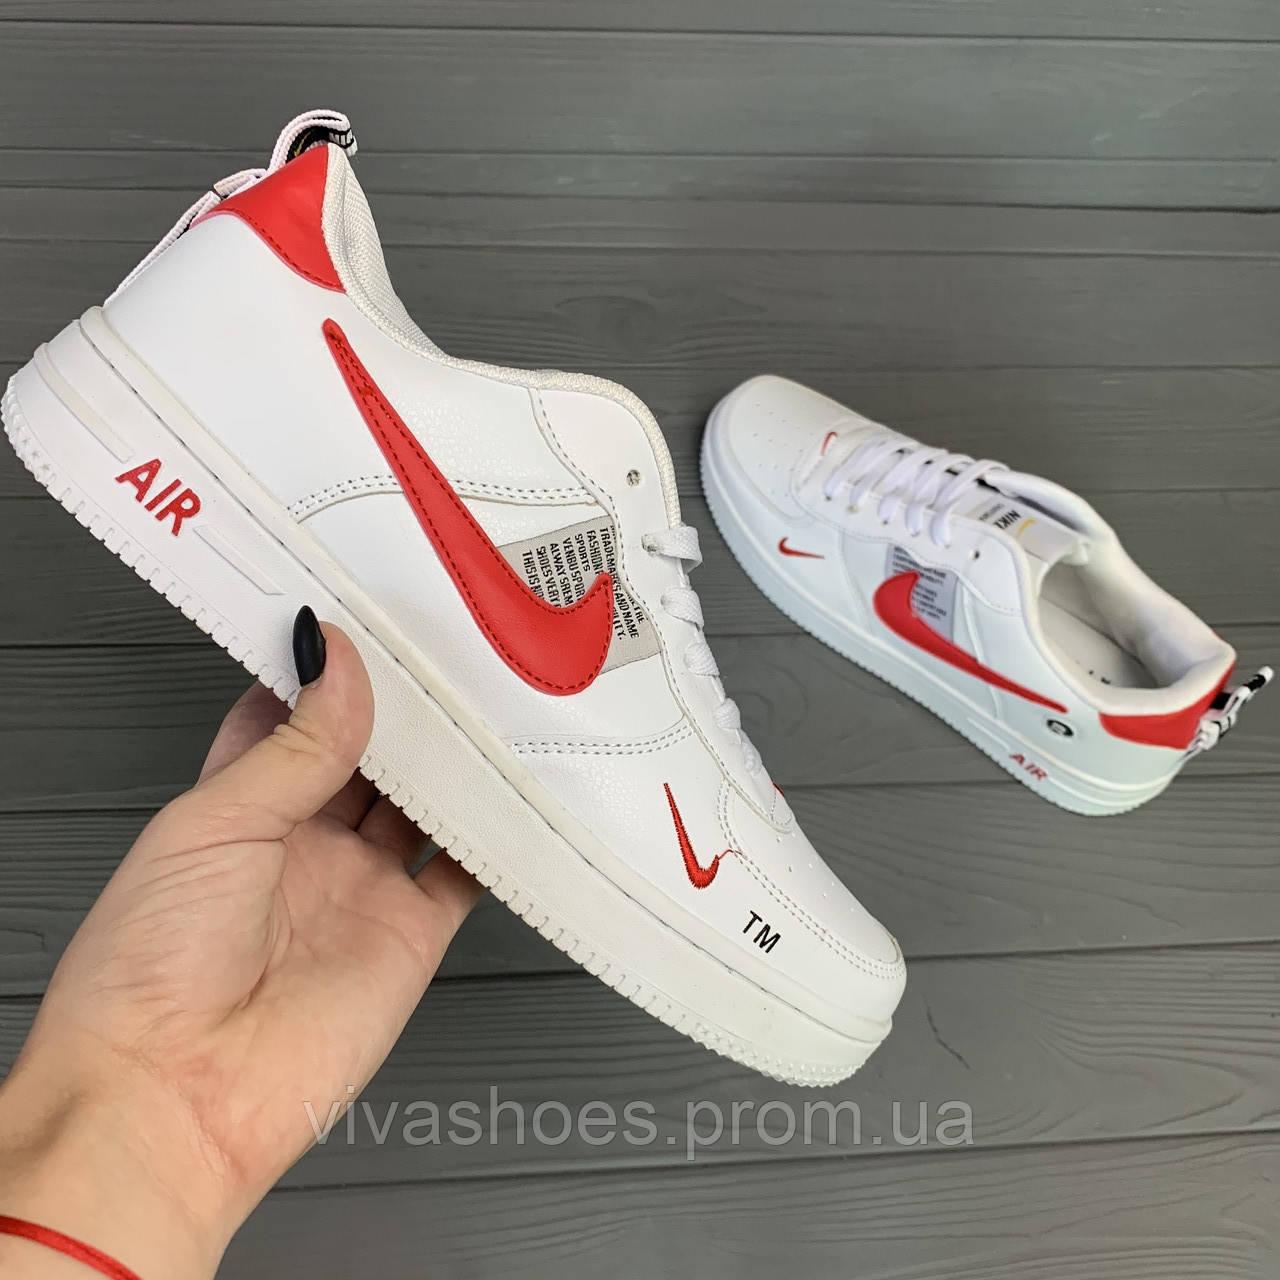 ecf04a27 Кроссовки мужские Nike Air в стиле Найк Аир, натуральная кожа, текстиль код  RD-